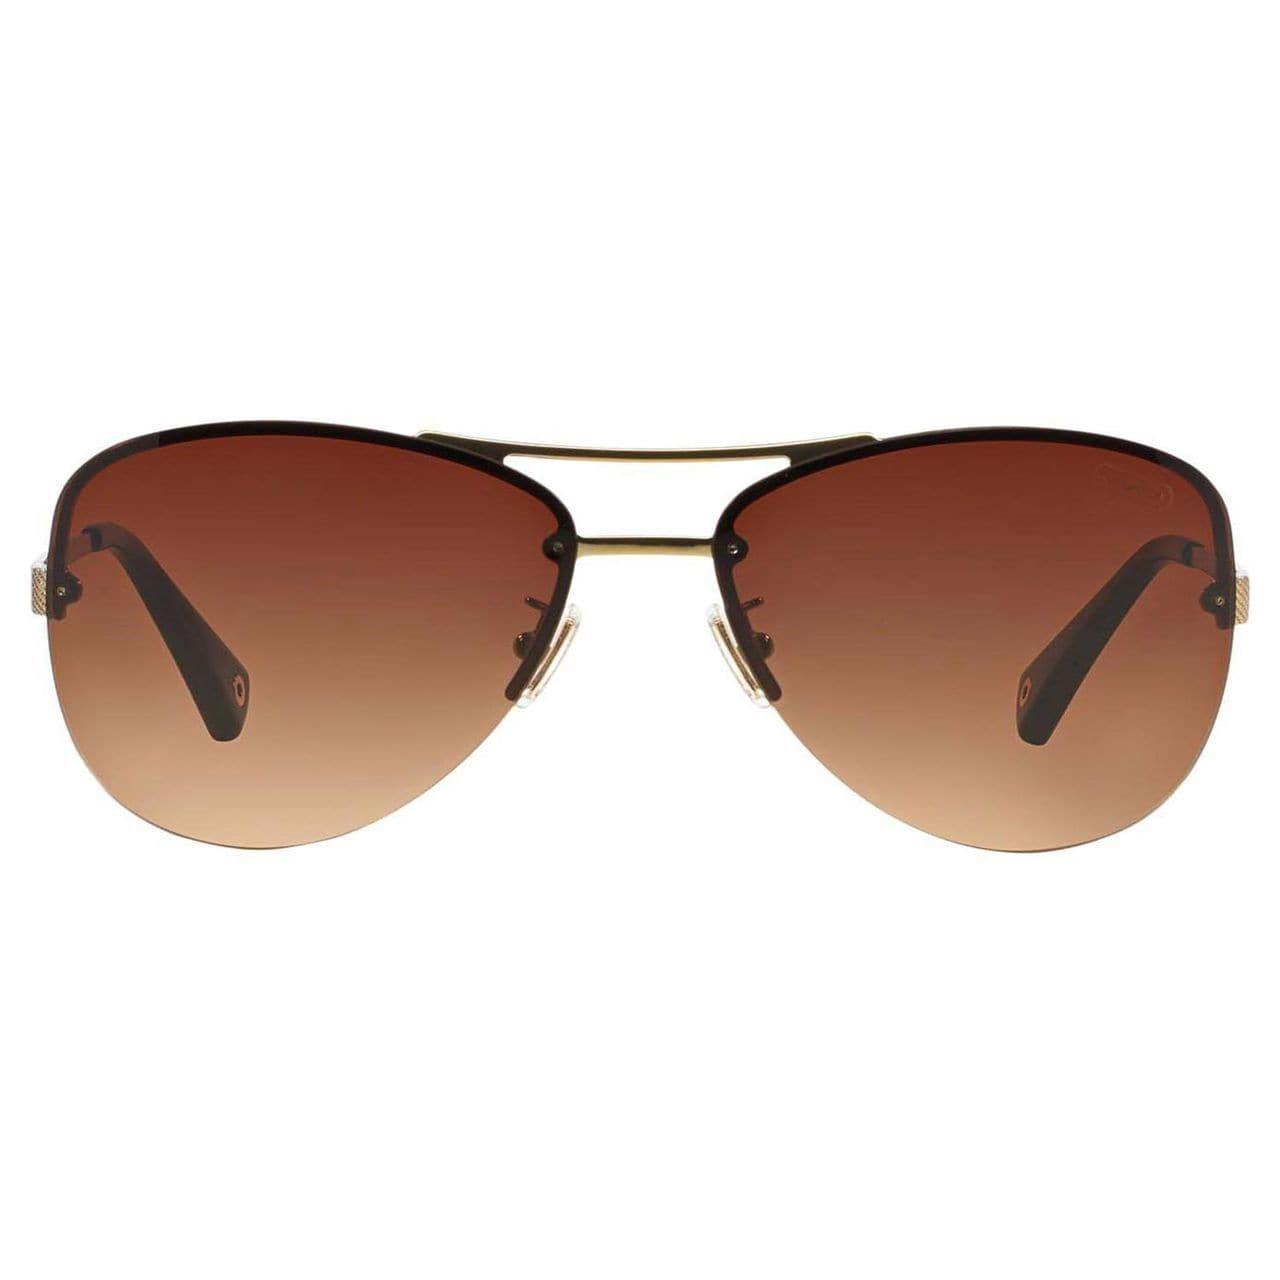 33bc328cd104 Shop Coach Women's HC7026 L056 Jasmine 909913 Metal Pilot Sunglasses - Gold  - Free Shipping Today - Overstock - 10305232